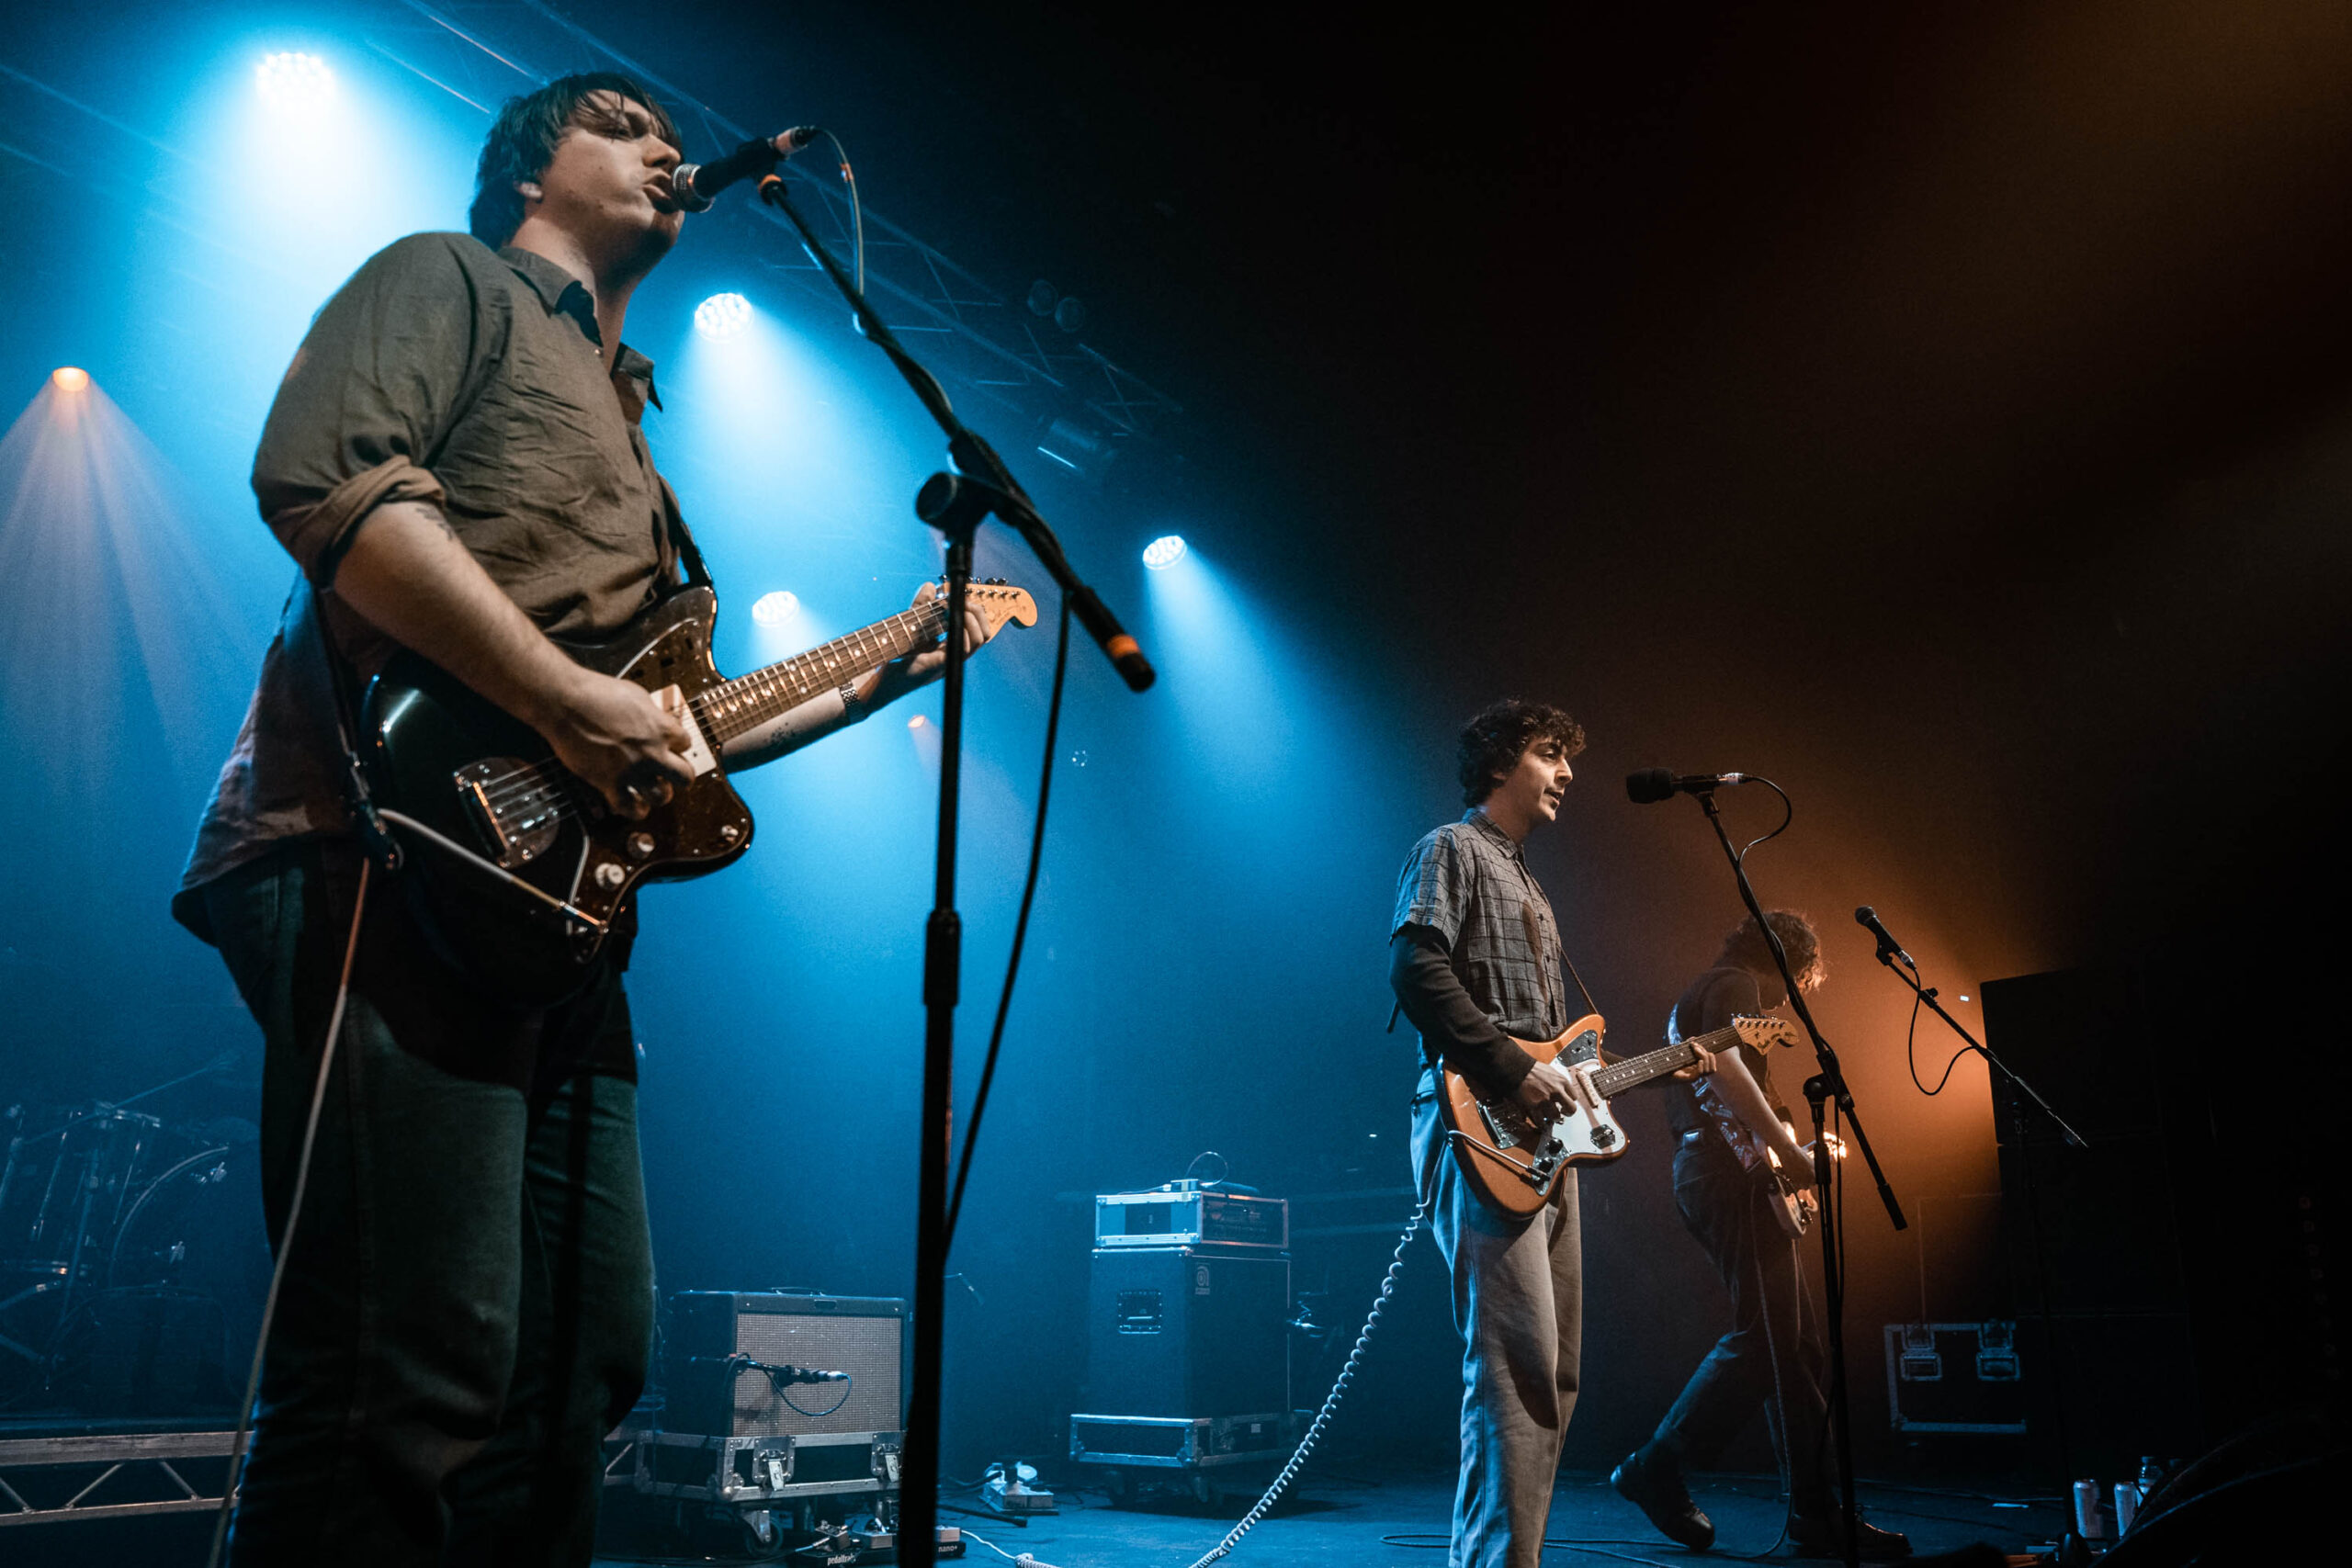 Twin Peaks - Electric Brixton London - GIG GOER 2020